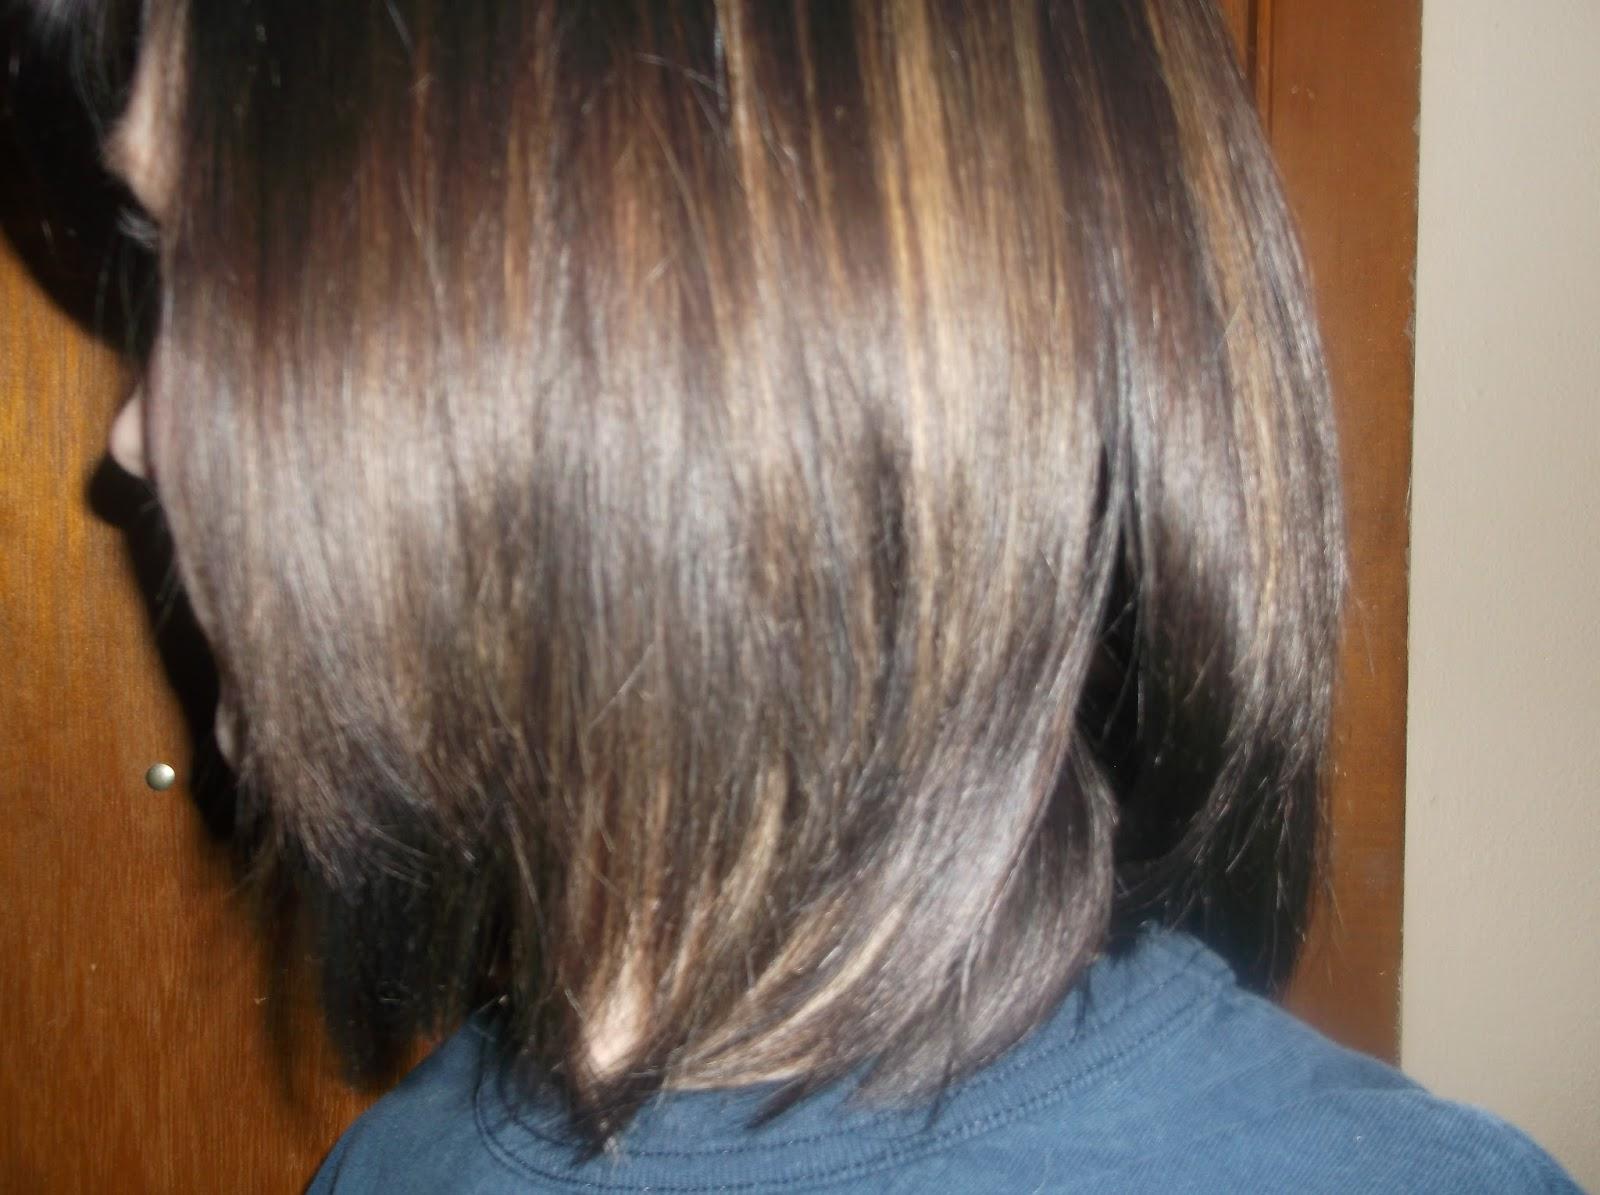 Brown Hair With Blonde Peekaboo Highlights Peek-a-boo highlights.